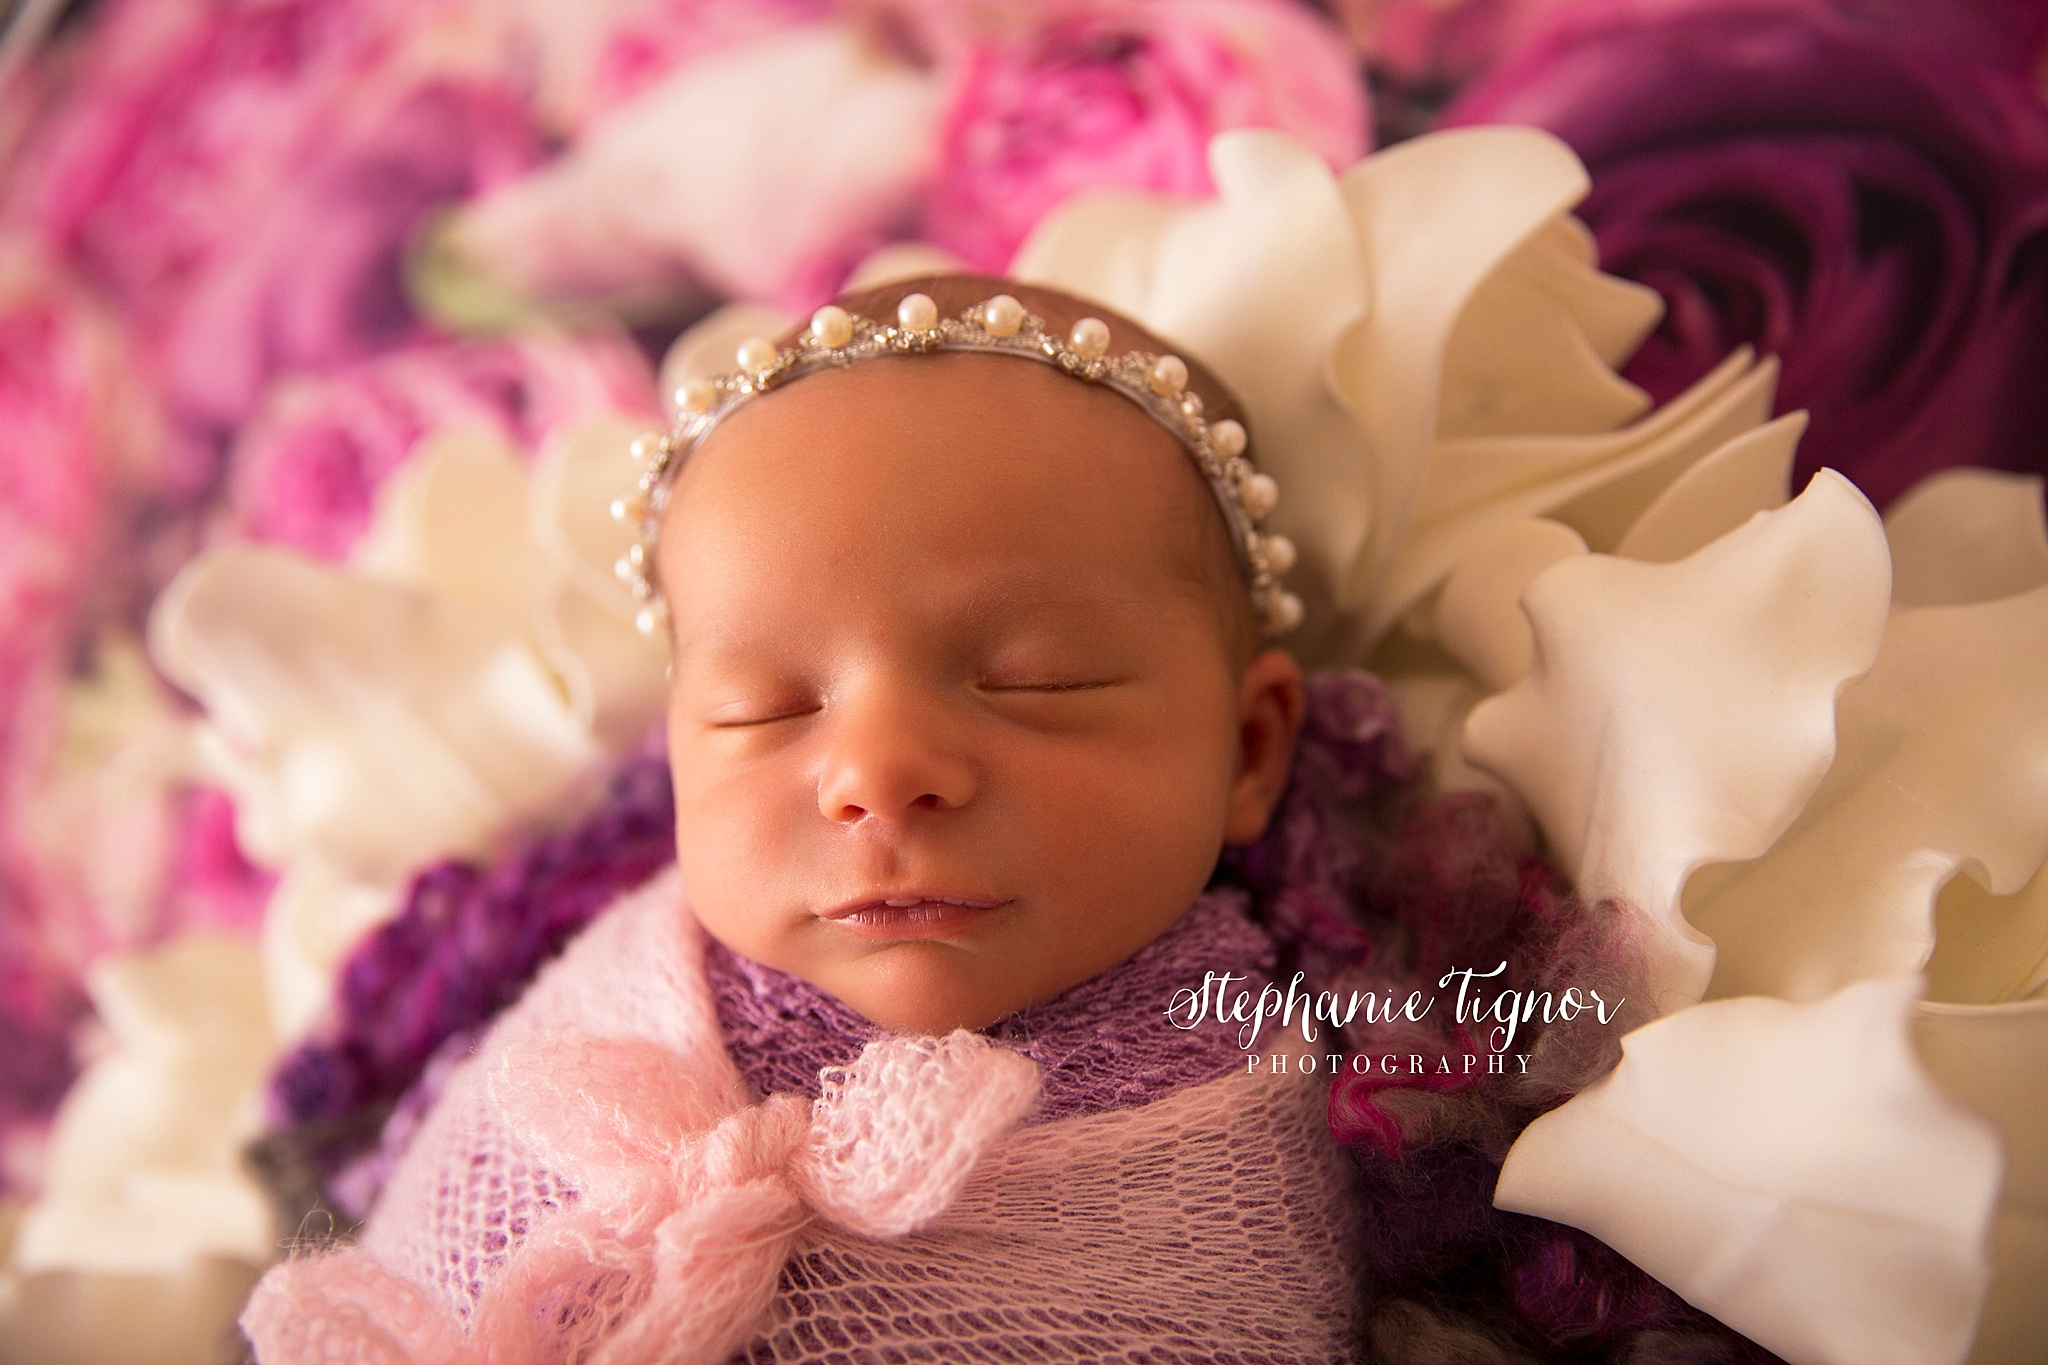 Stephanie Tignor Photography   Fredericksburg VA Newborn Photographer   Warrenton VA Newborn Photographer   Stafford VA Newborn Photographer   Newborn Photographer